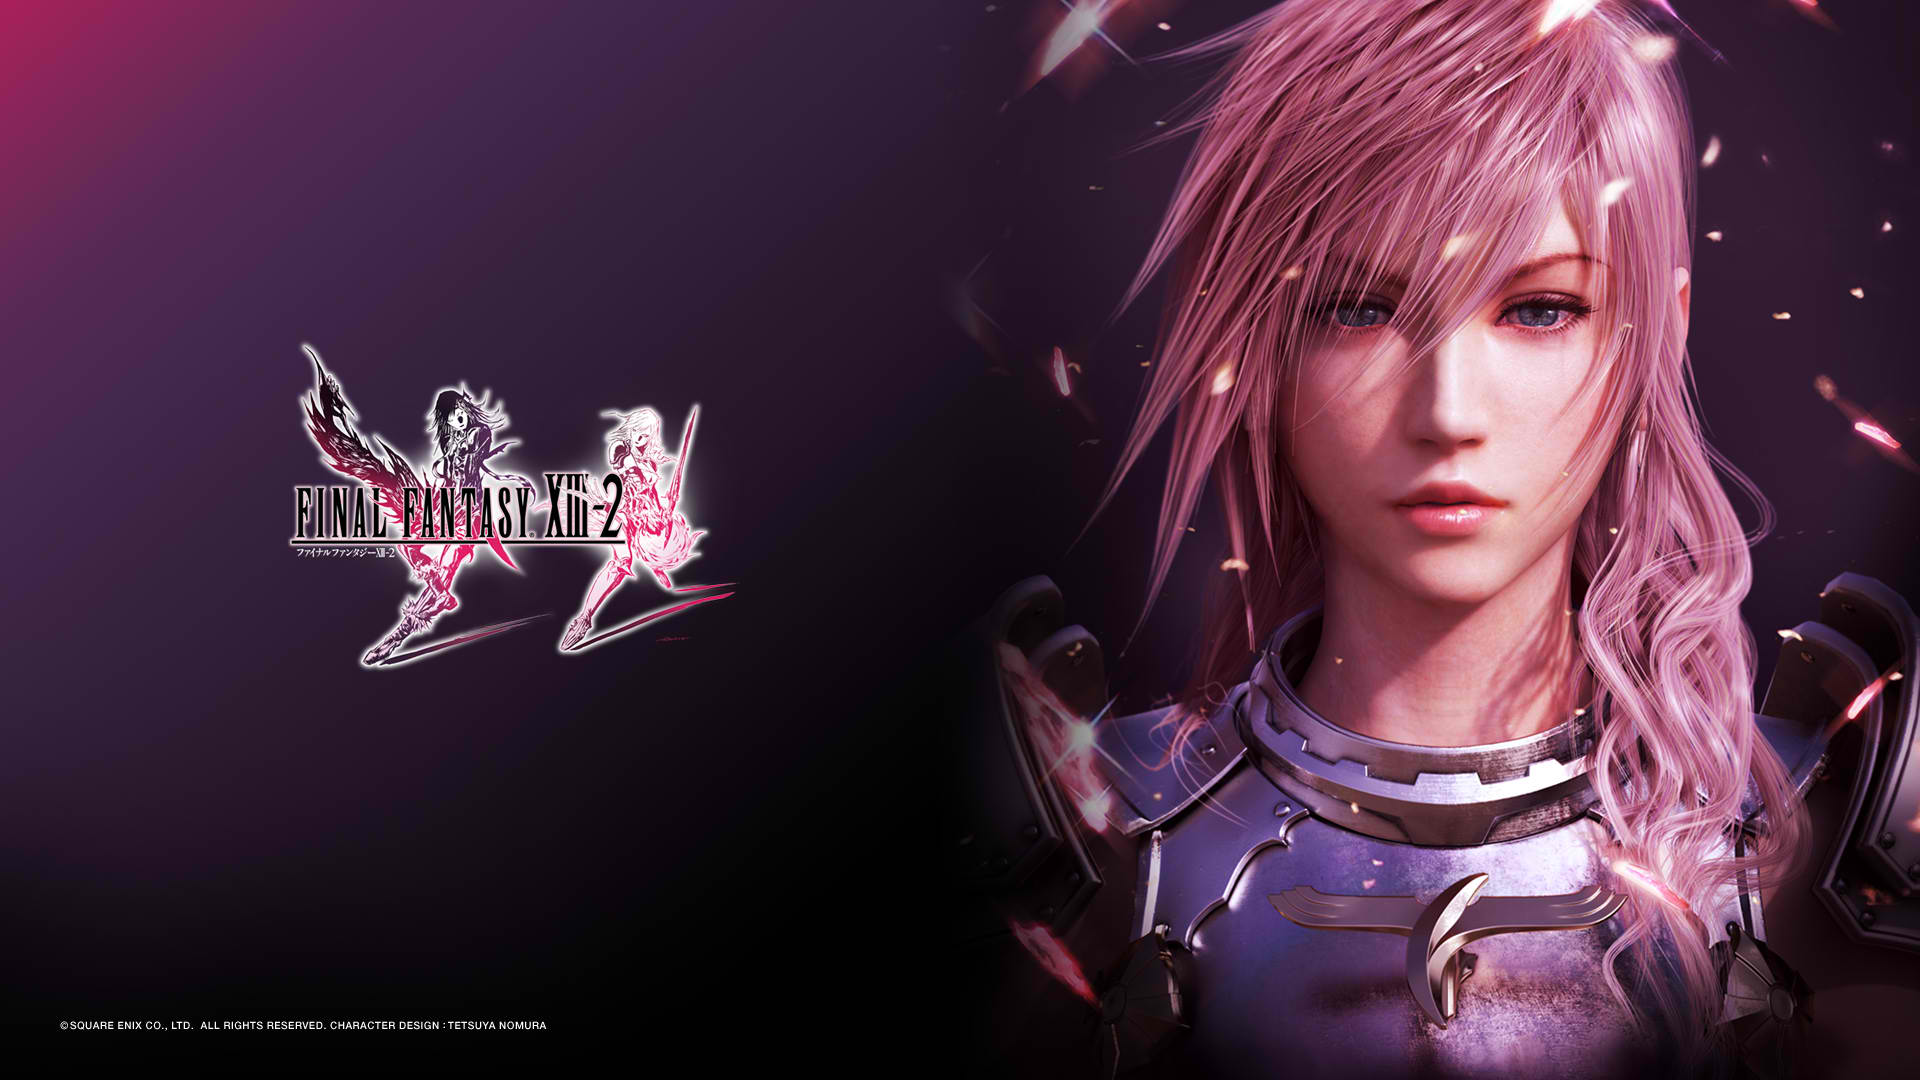 Final Fantasy Xiii 2 Wallpaper Hd wallpaper   479363 1920x1080